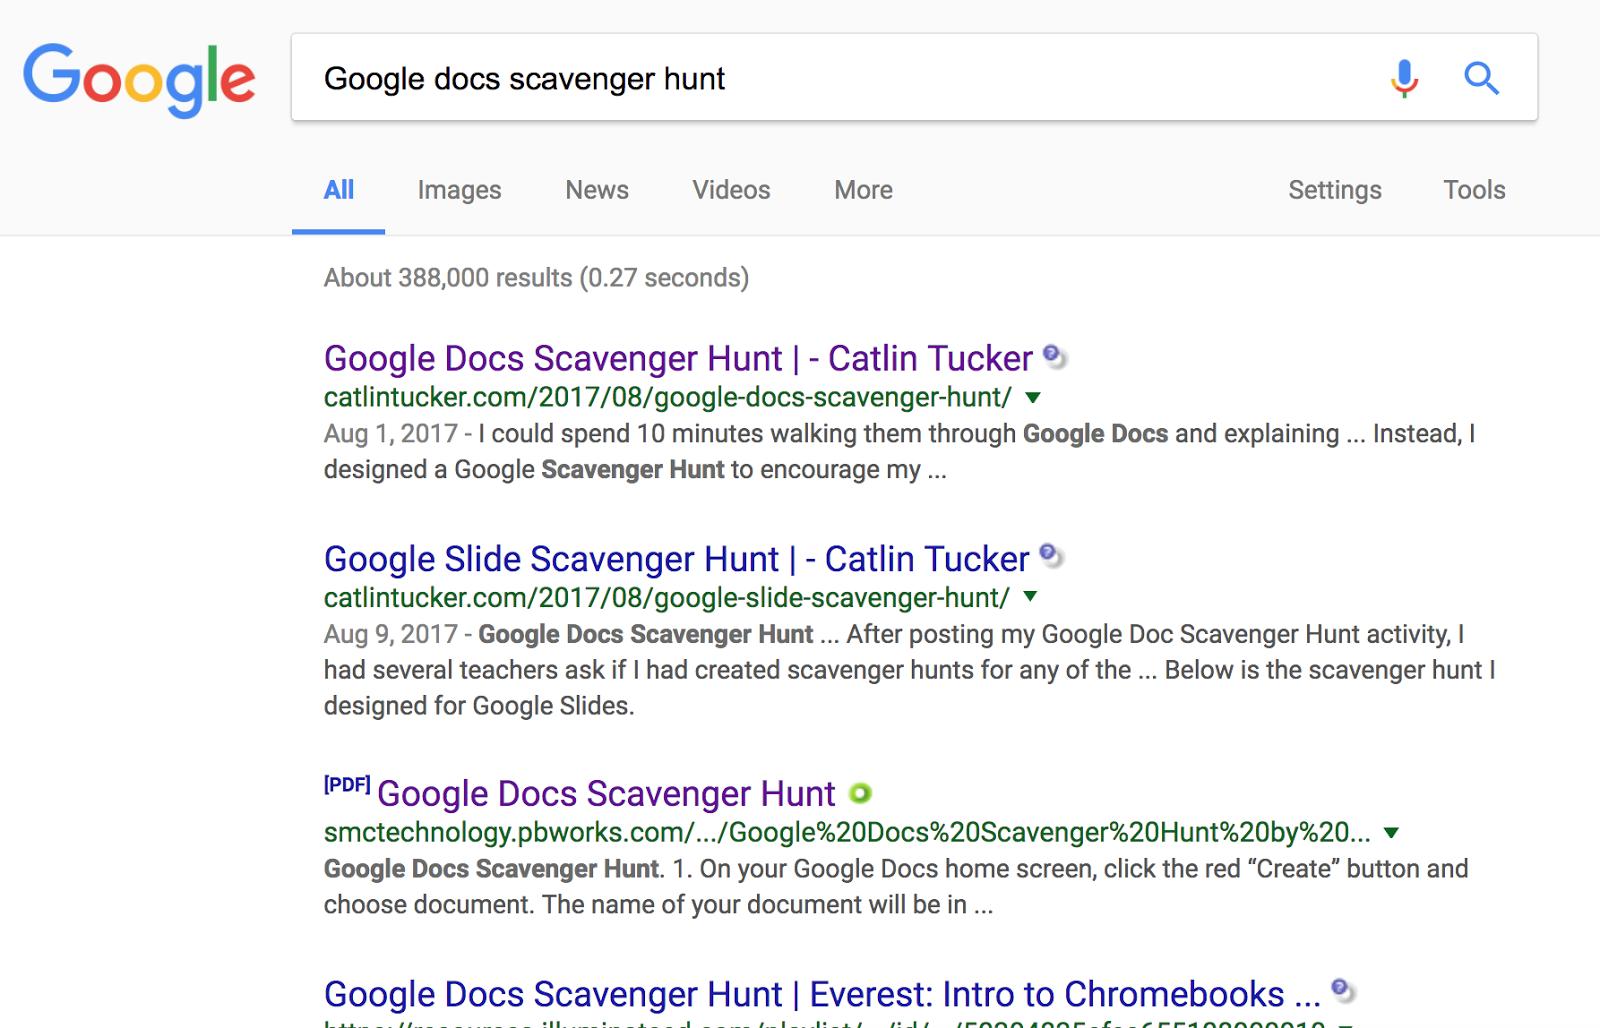 Scratching kids' brains: Google Docs Scavenger Hunt